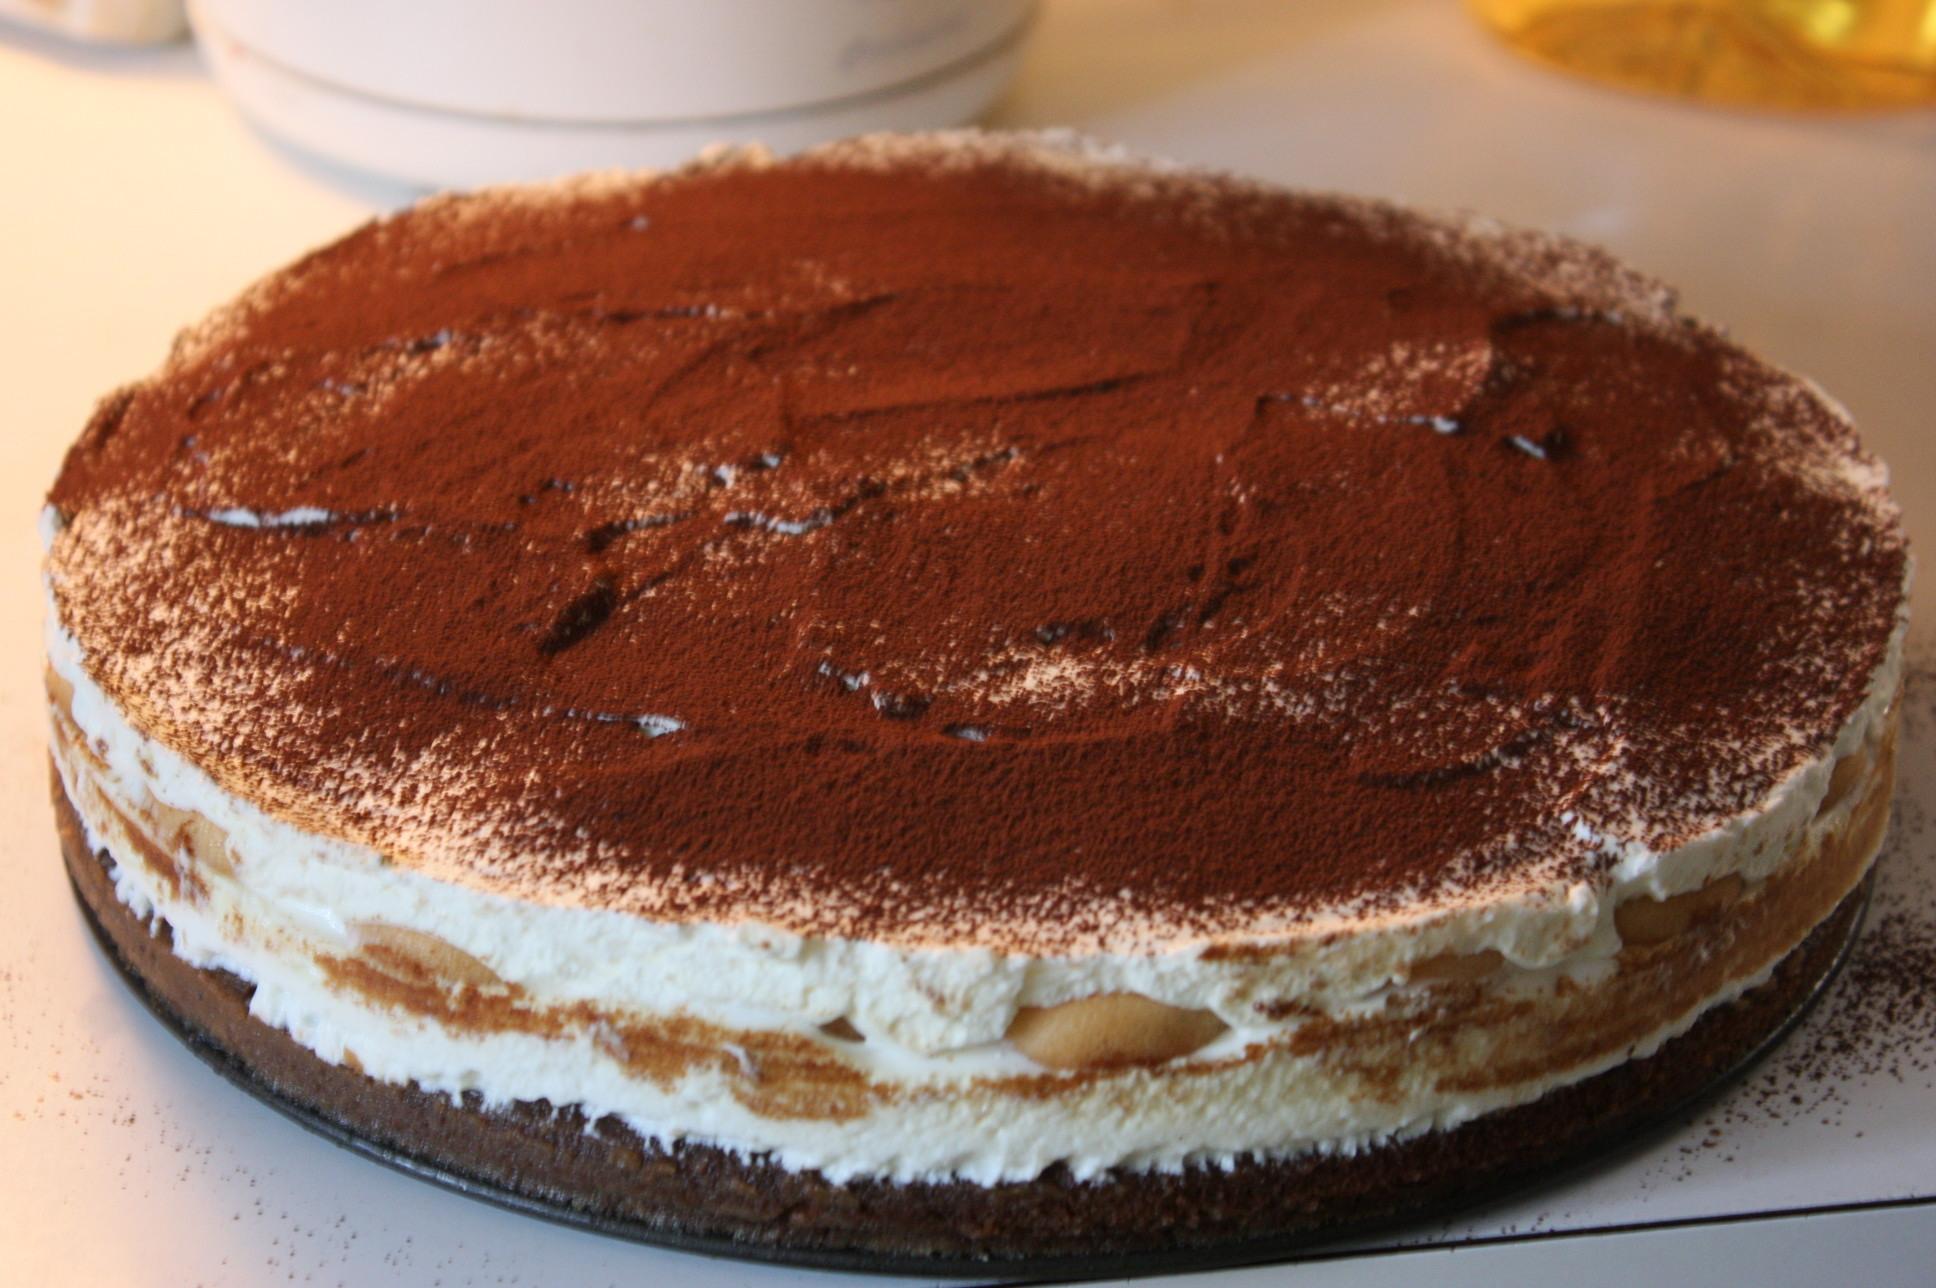 Fotografie receptu: Tiramisu Jamieho Oliviera podle Mony